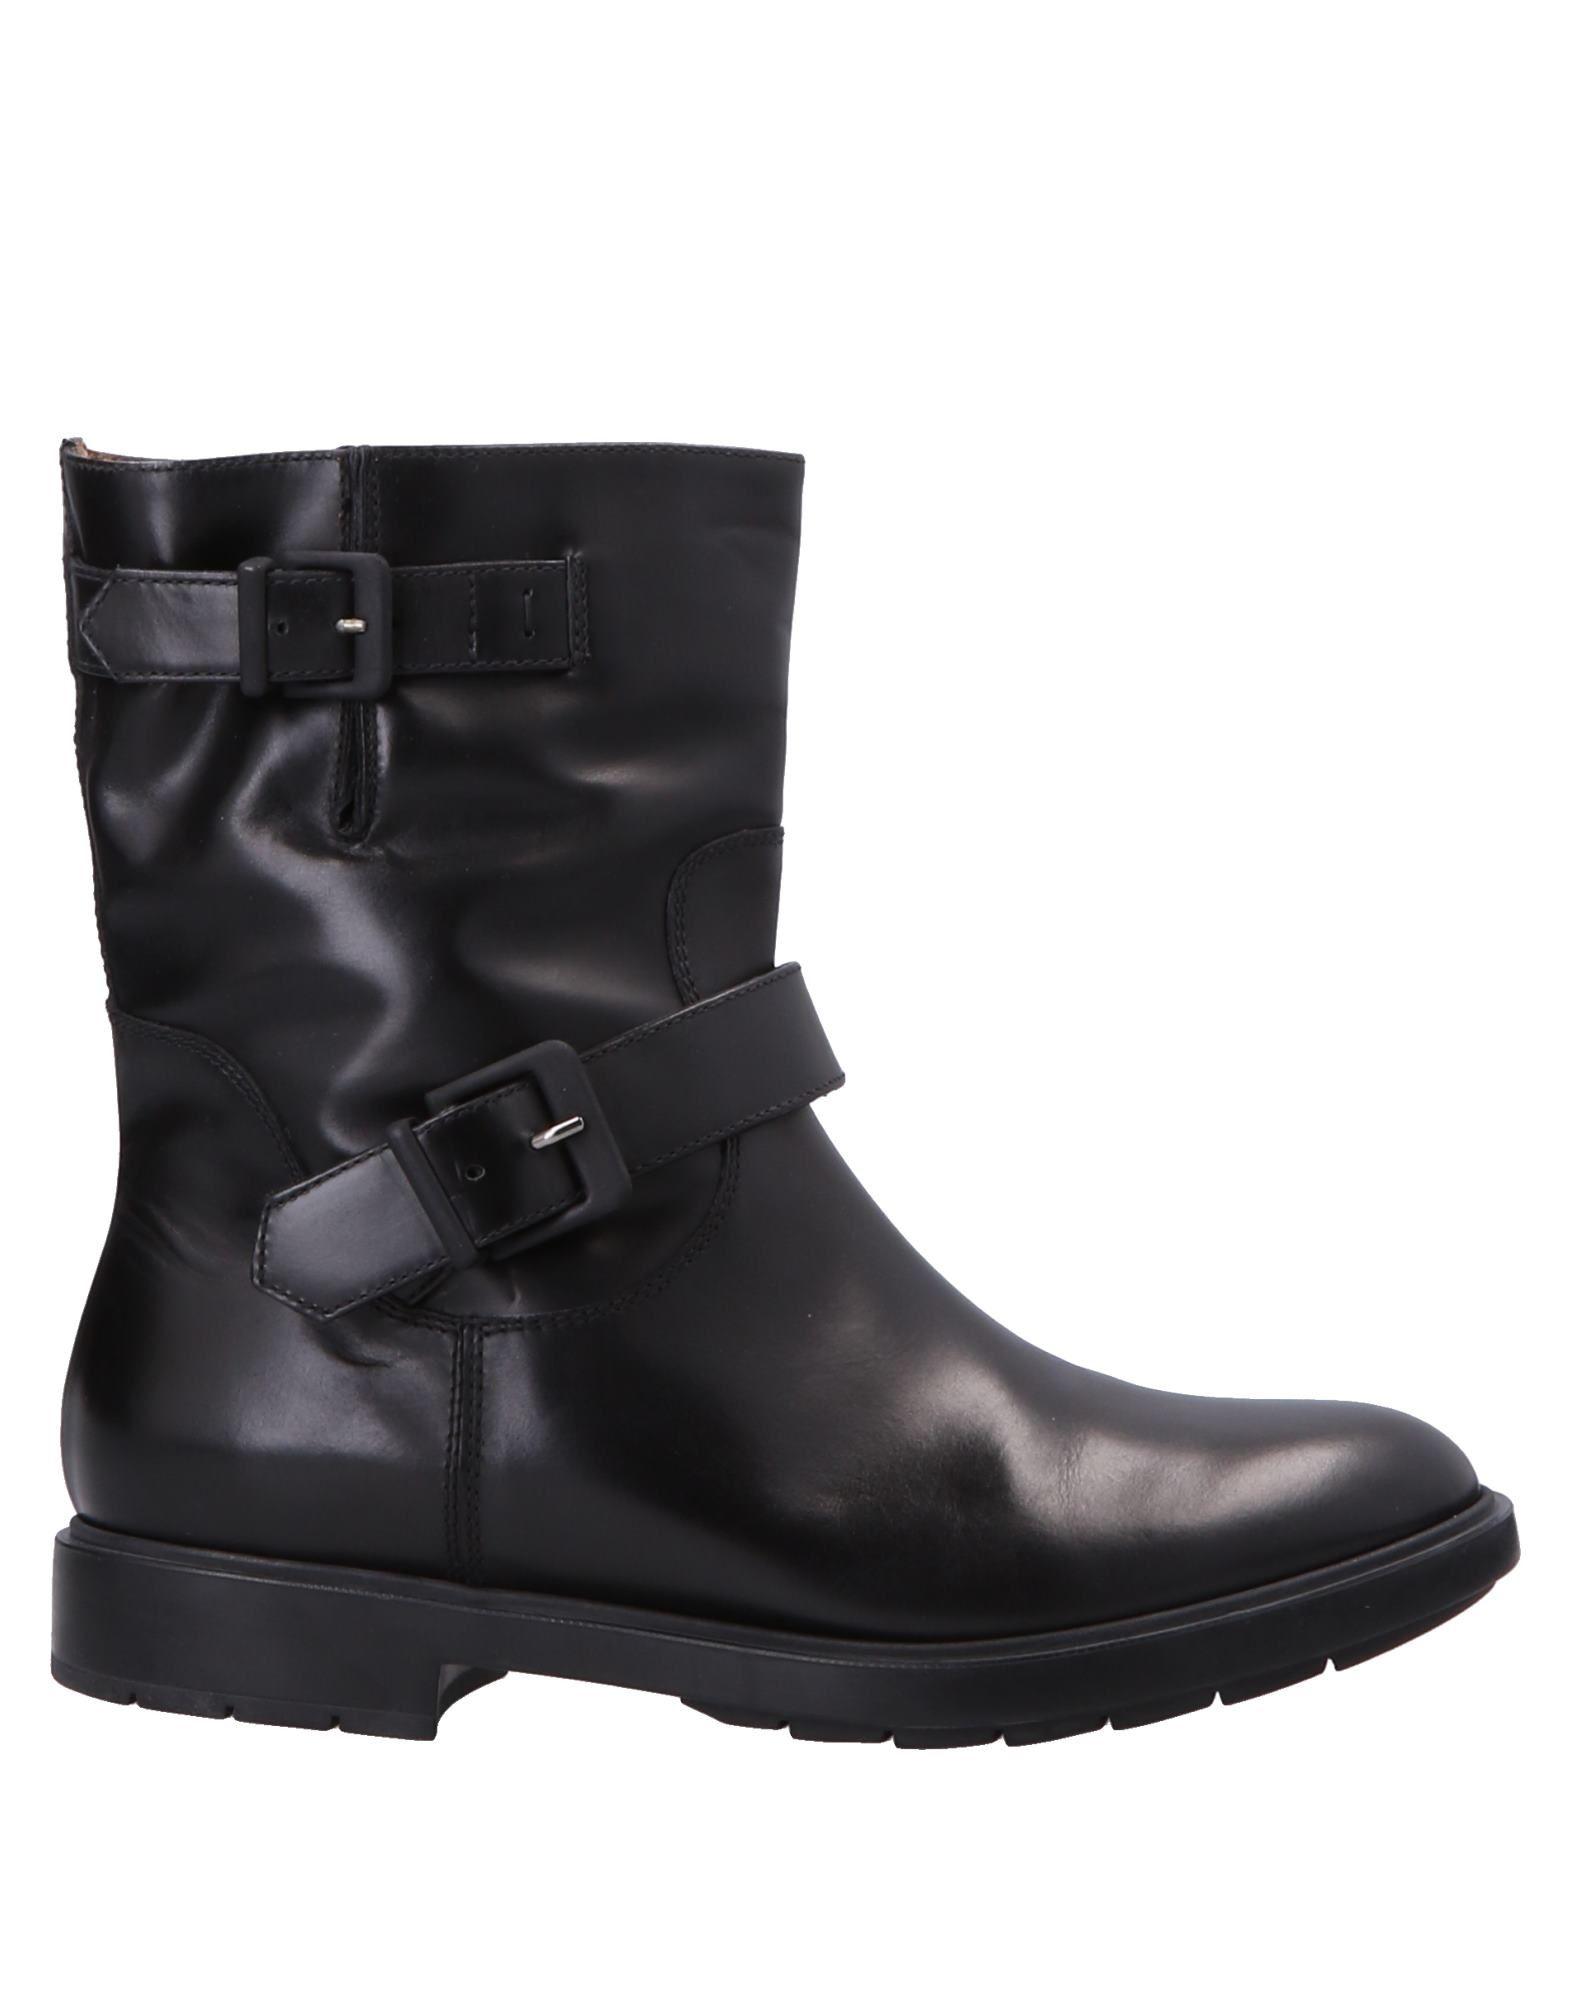 Rabatt Schuhe Fratelli Rossetti Stiefelette Damen  11550393BW